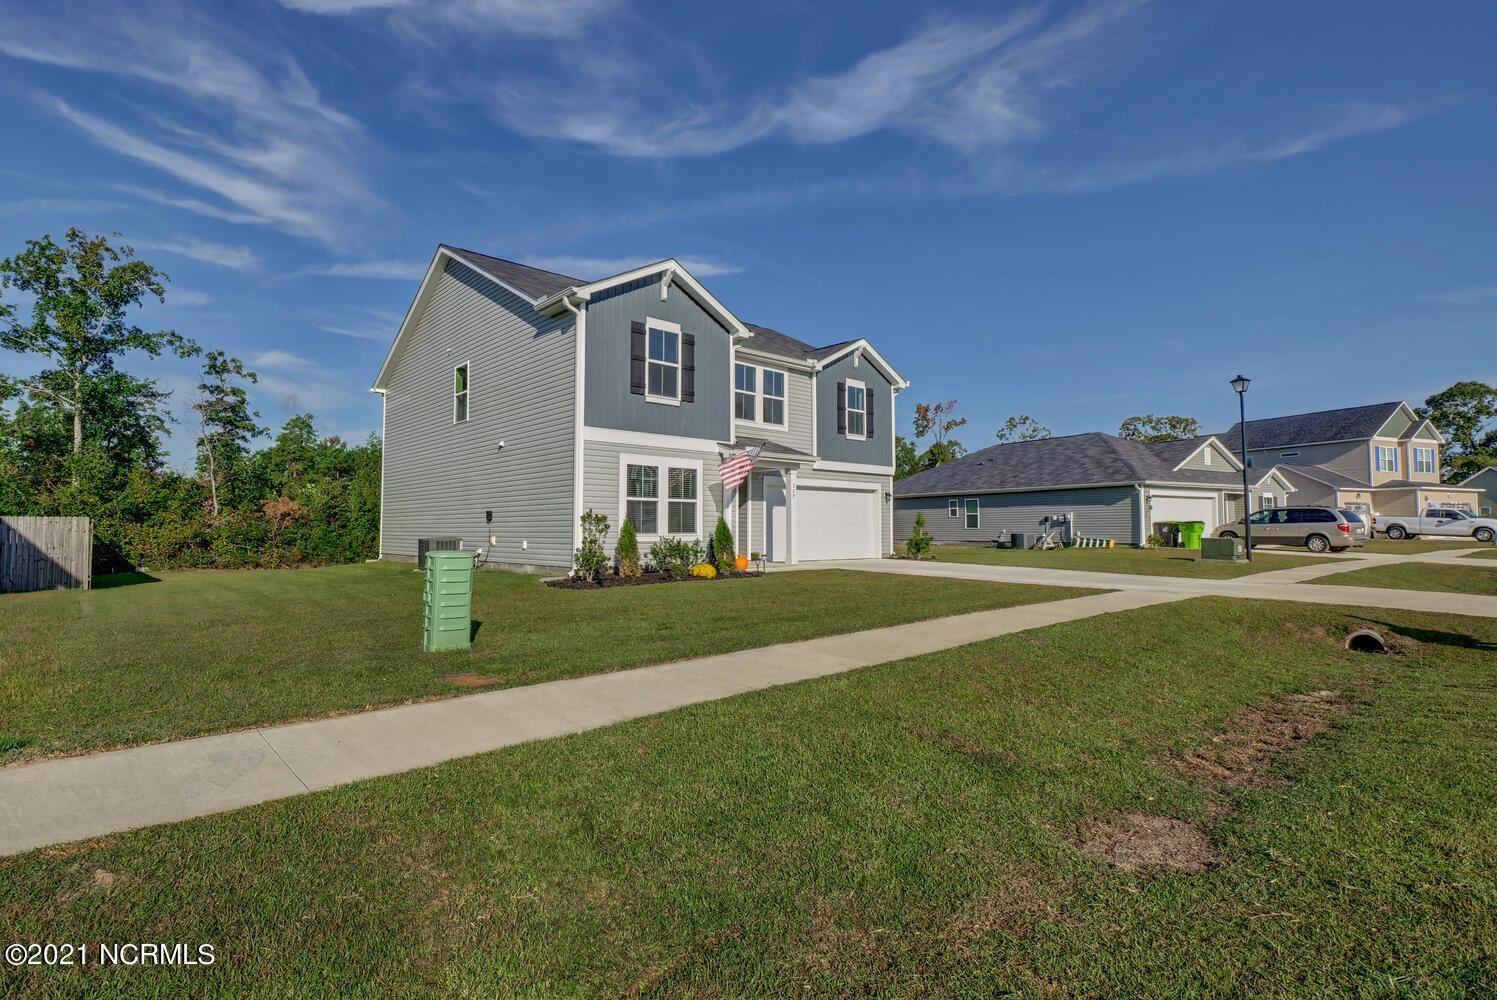 Photo of 322 Adobe Lane, Jacksonville, NC 28546 (MLS # 100293519)